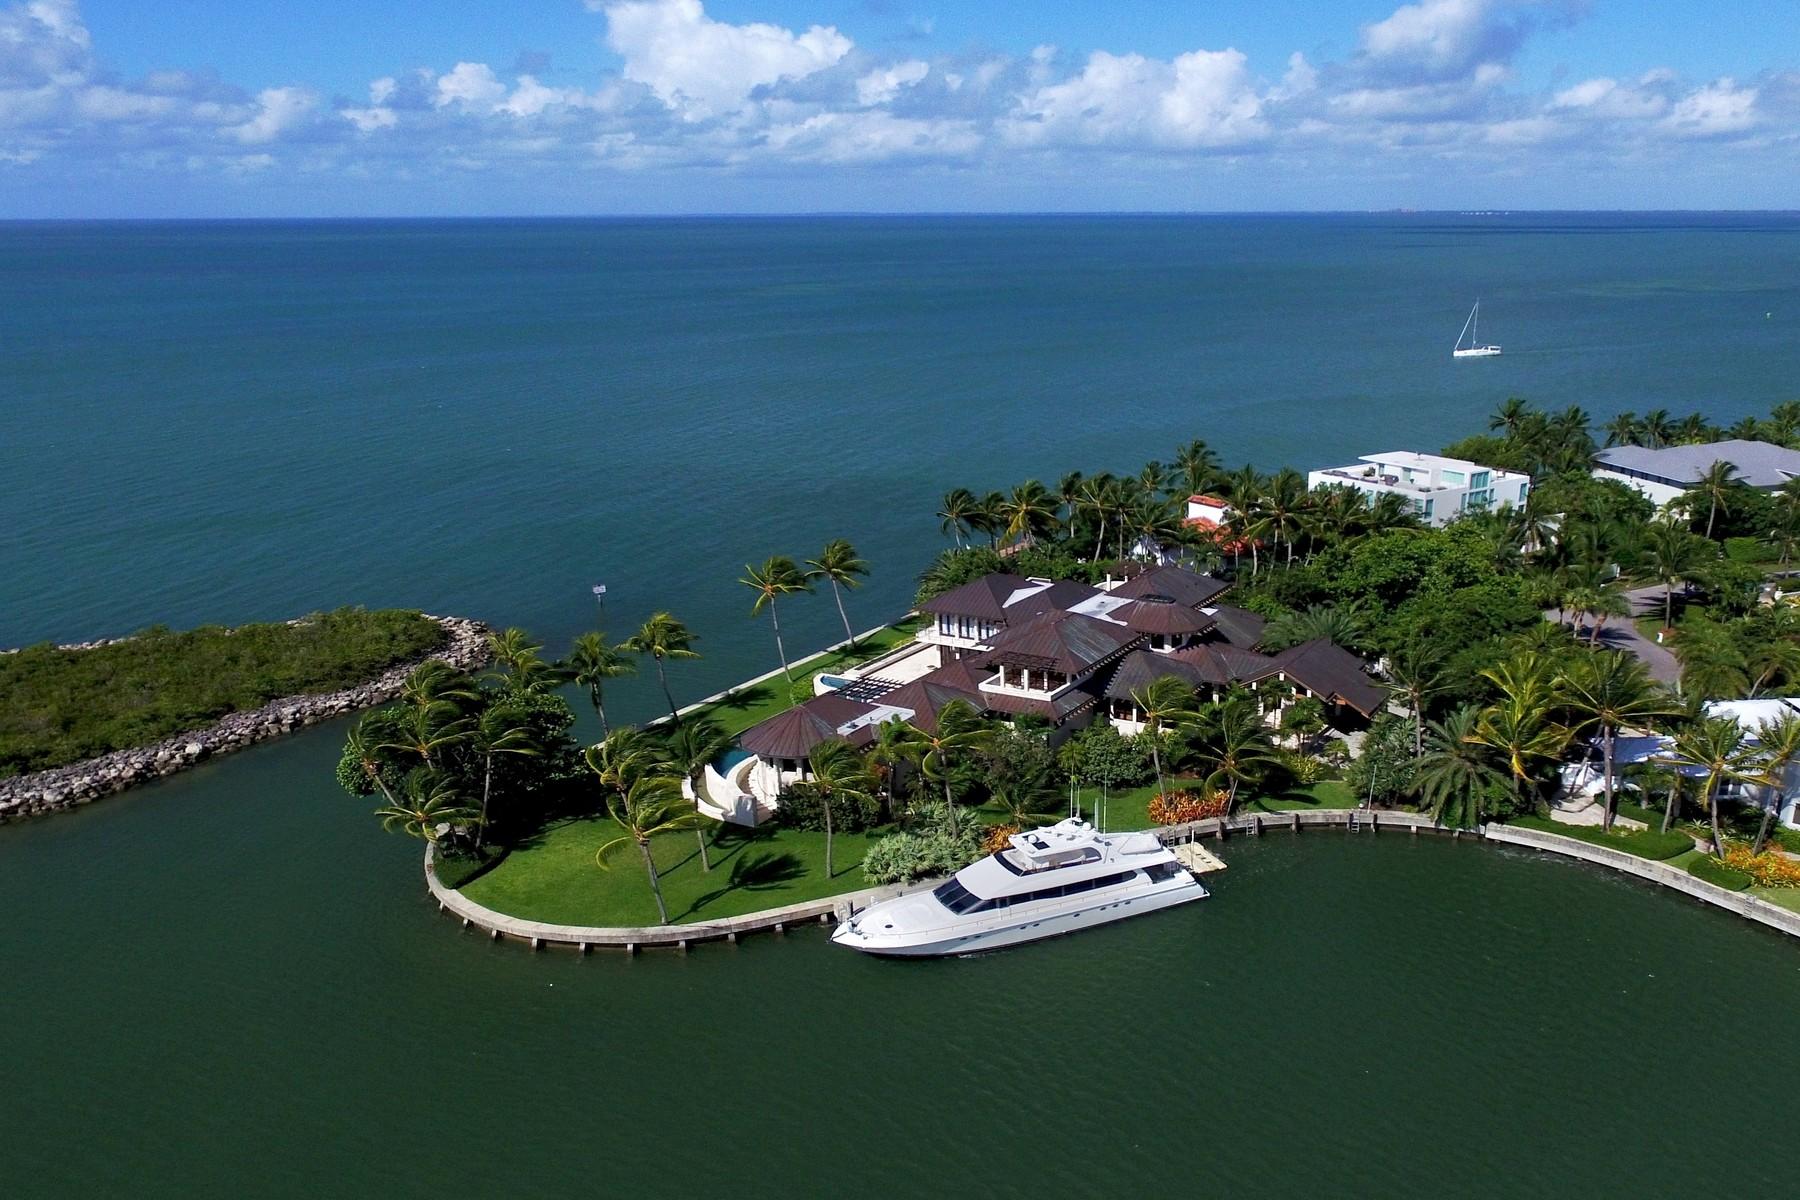 Villa per Vendita alle ore 400 S Mashta Dr Key Biscayne, Florida, 33149 Stati Uniti